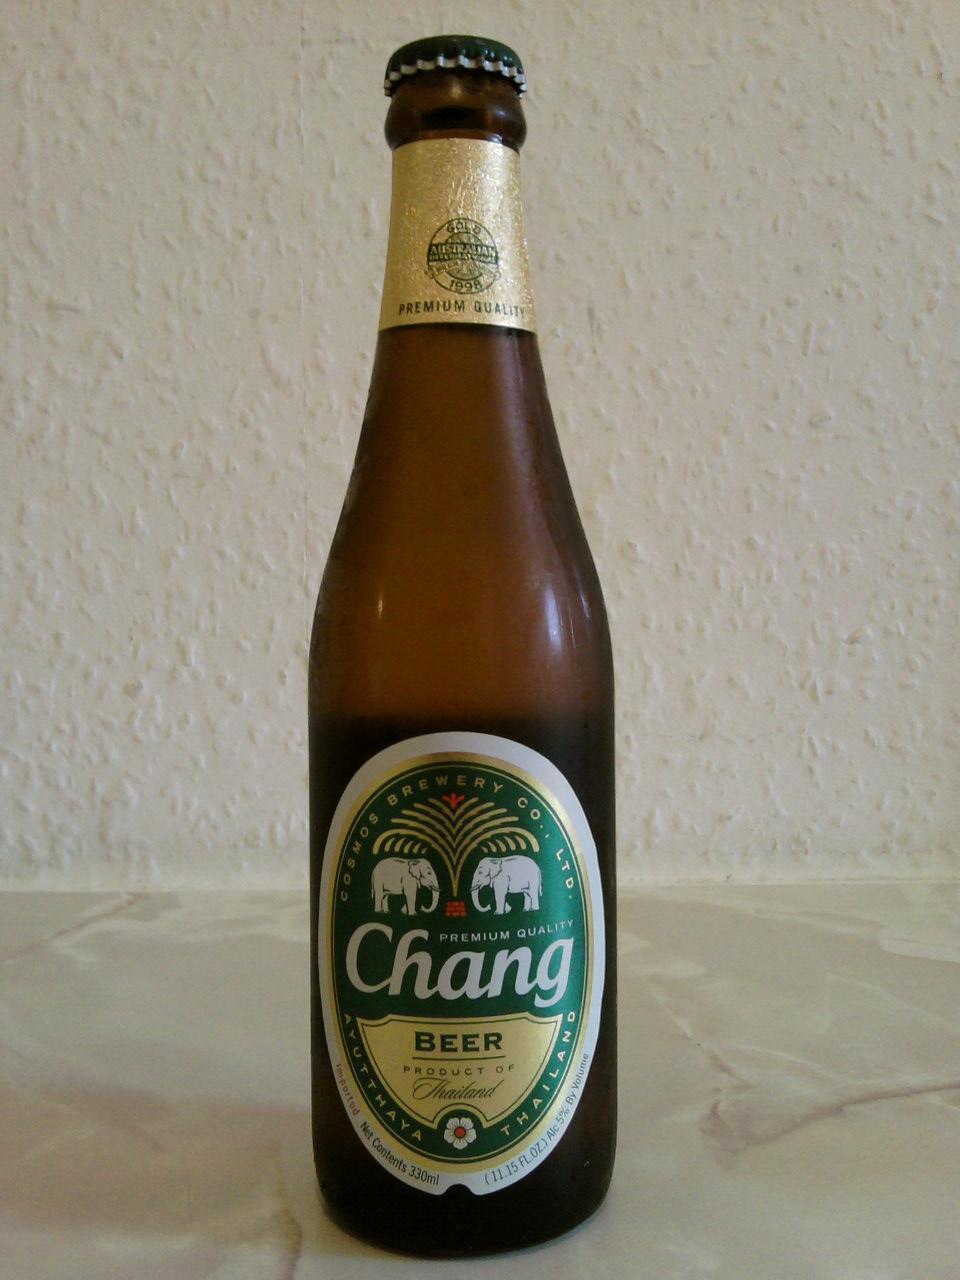 Chang Beer bottle